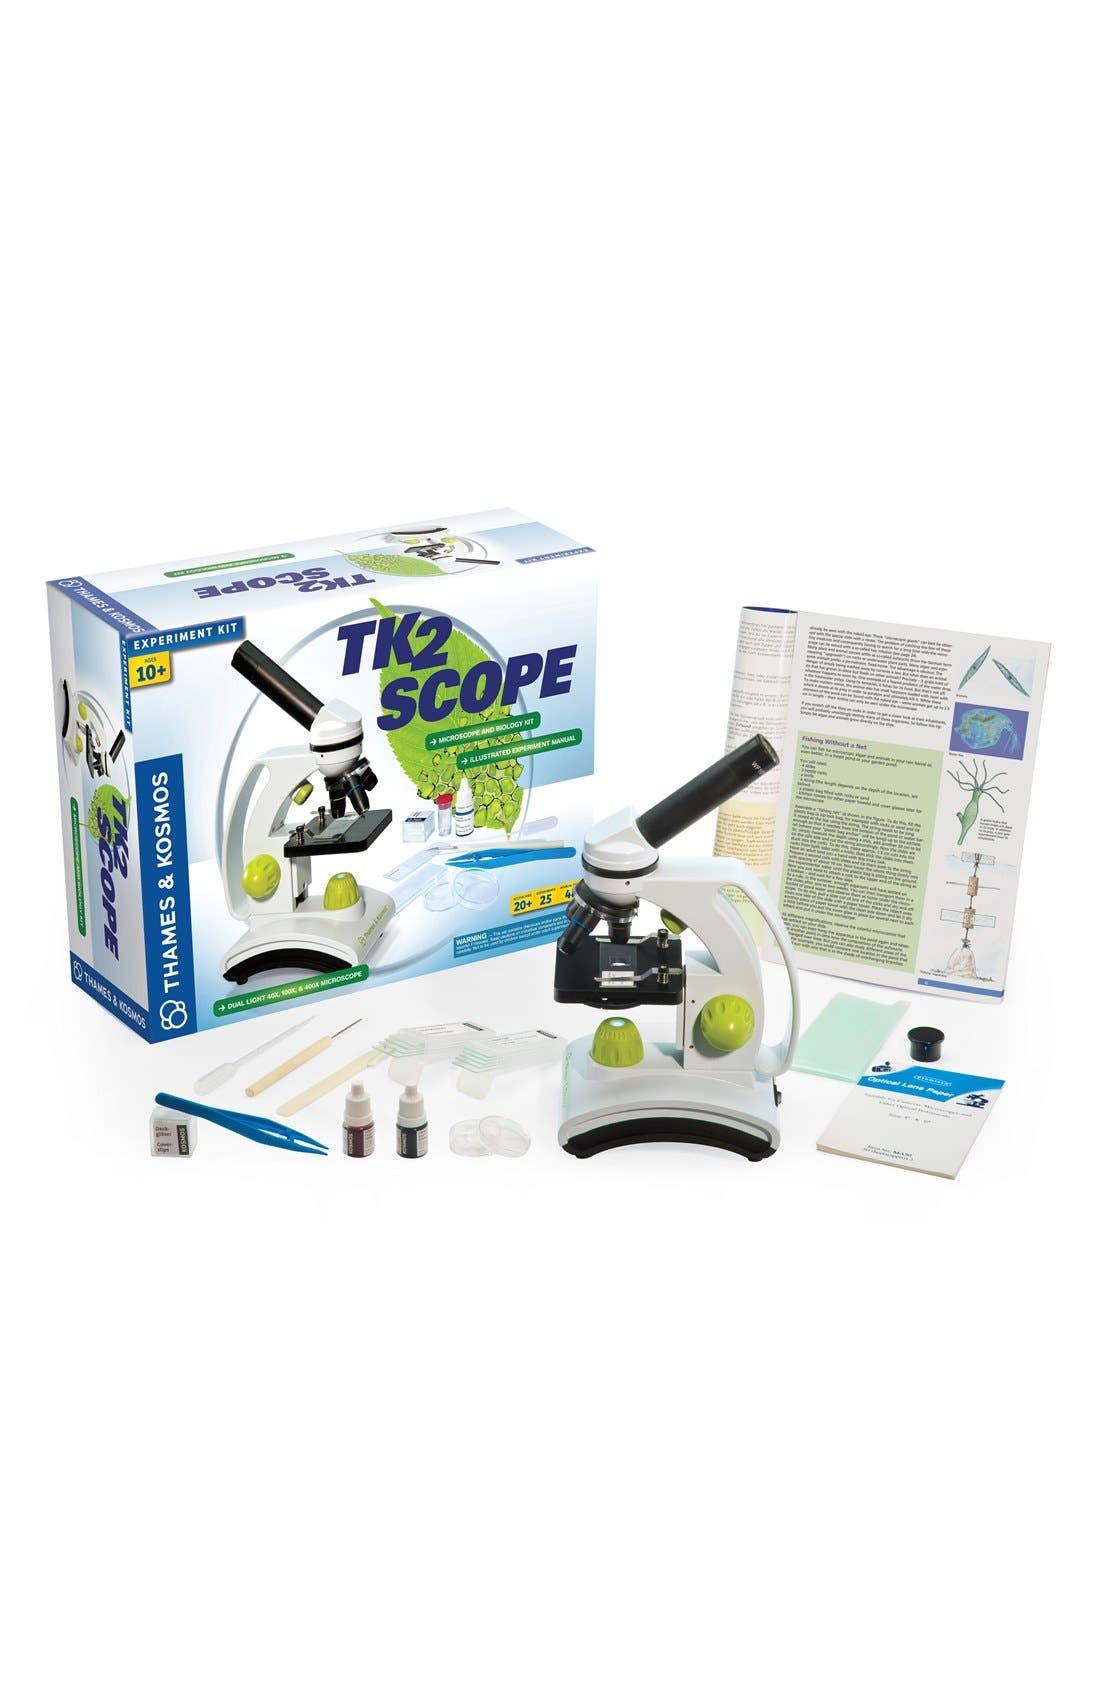 Thames & Kosmos 'TK2 Scope' Experiment Kit